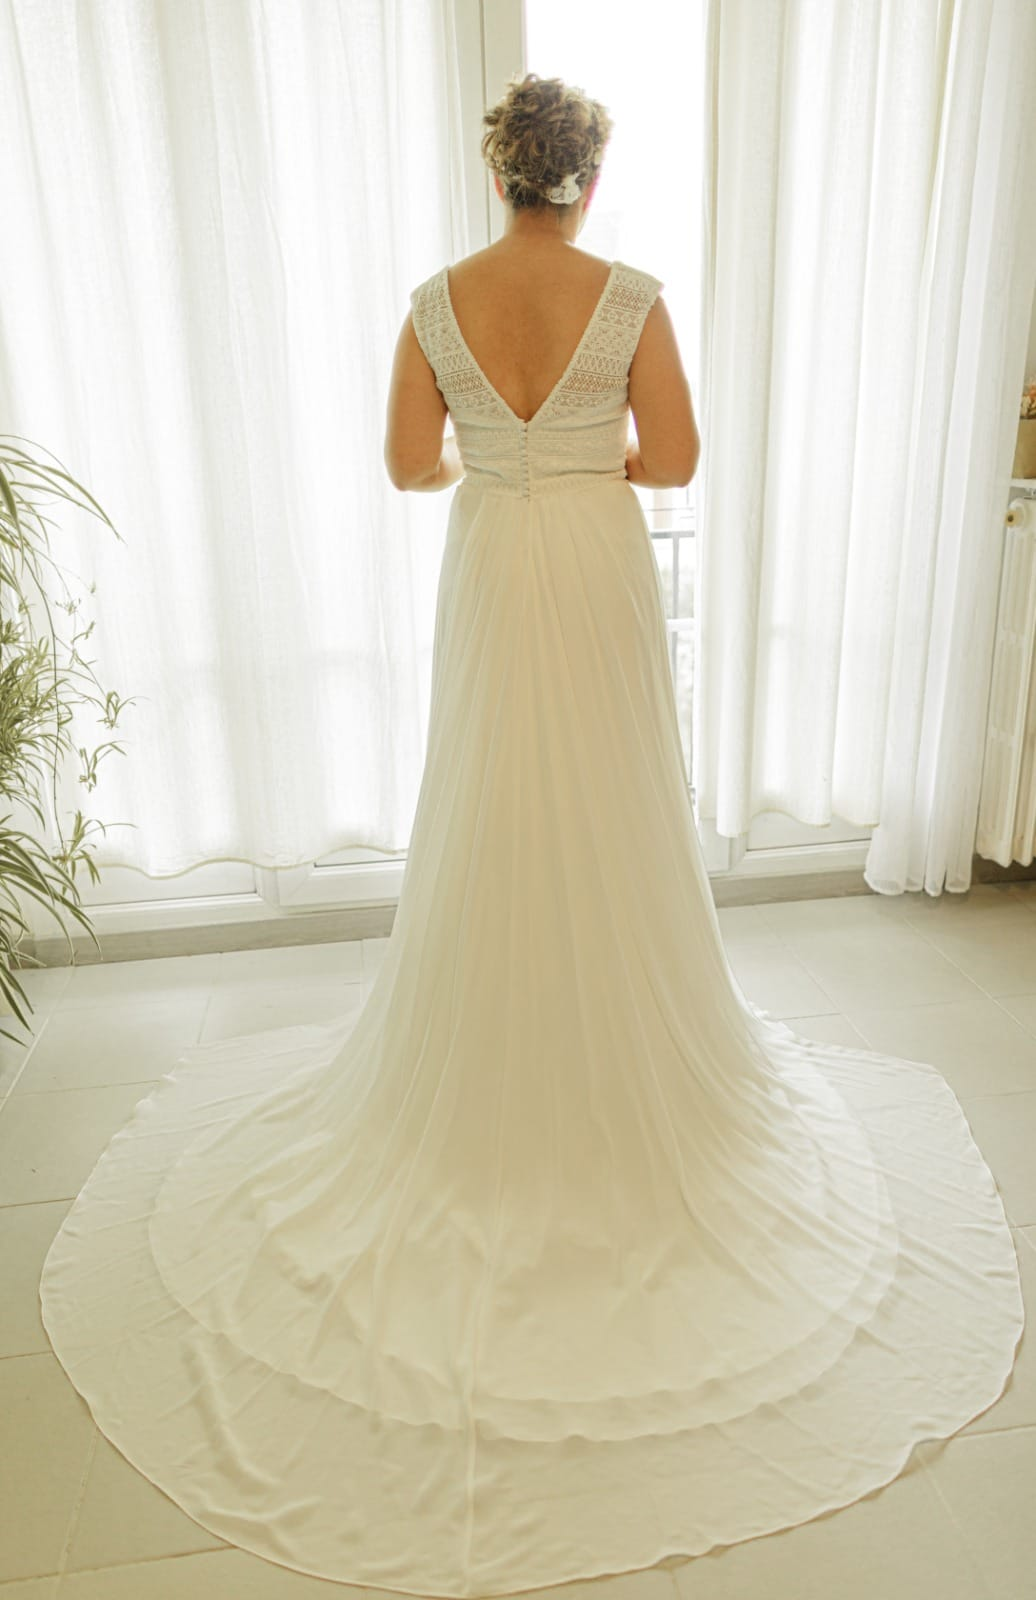 photographie robe mariée de dos